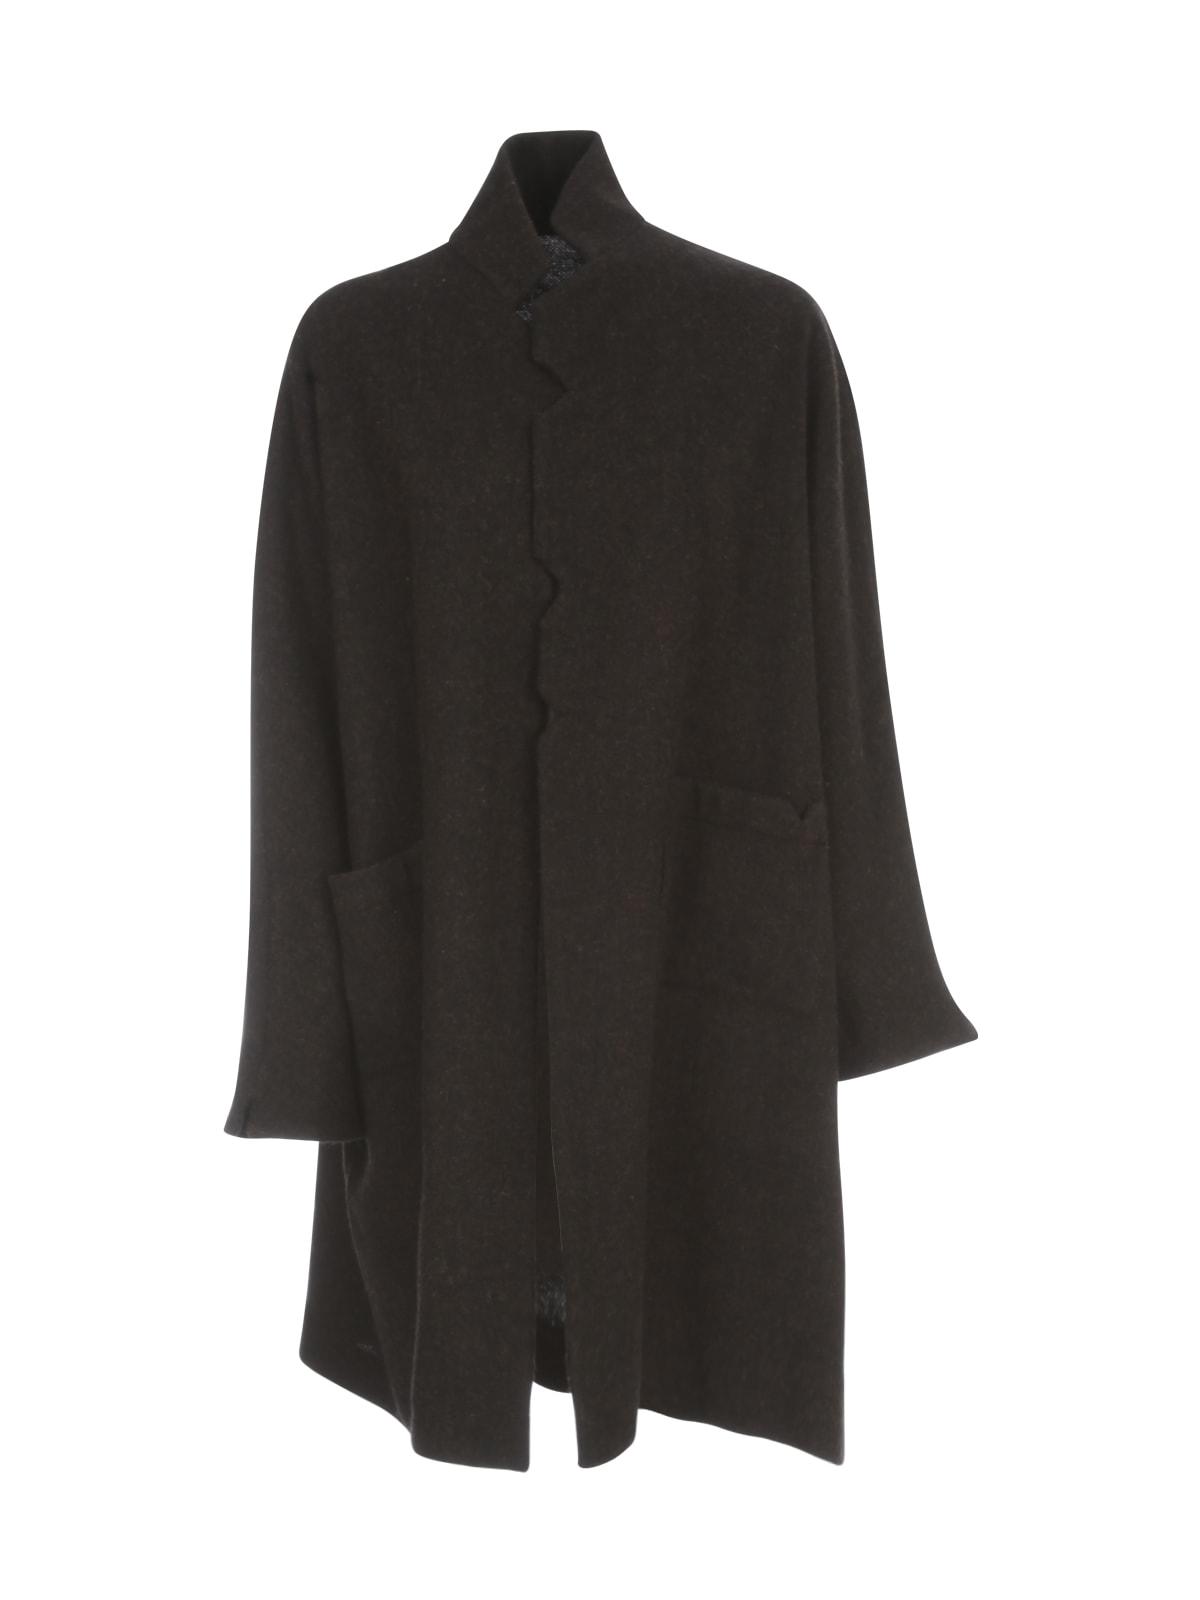 Daniela Gregis Peonia Cicoria 100% Wool High Neck Jacket